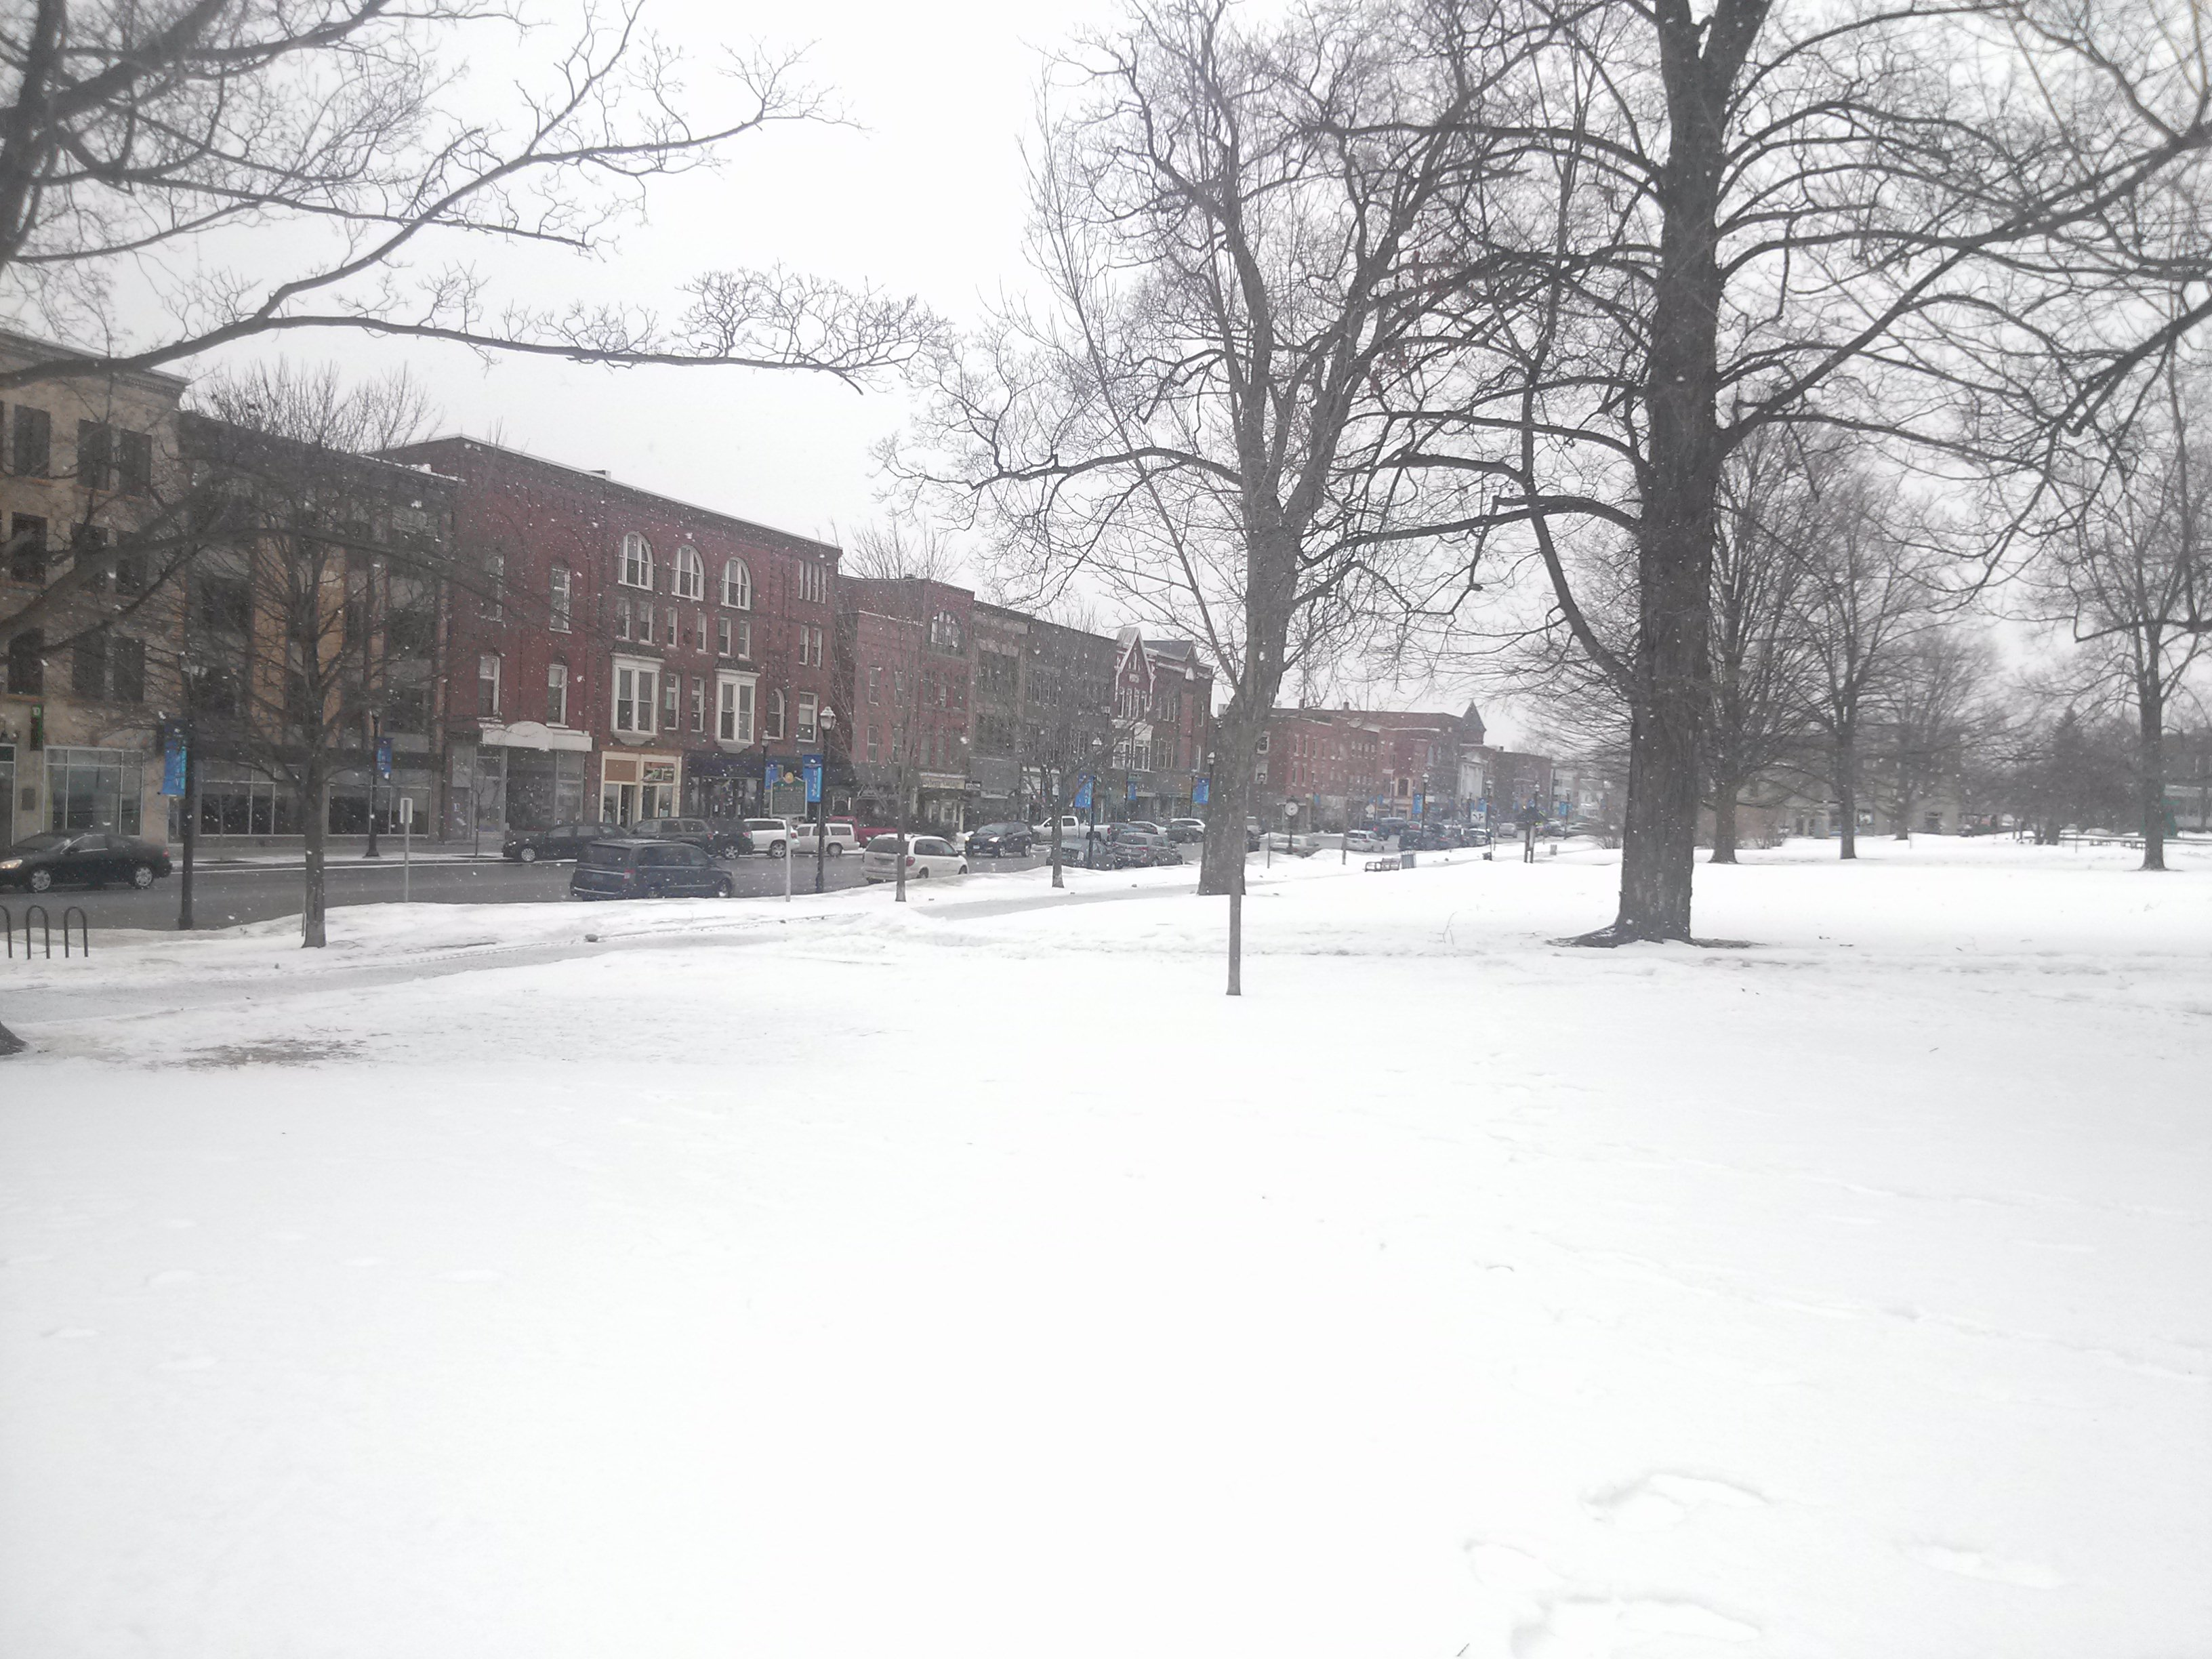 Snowy St Albans